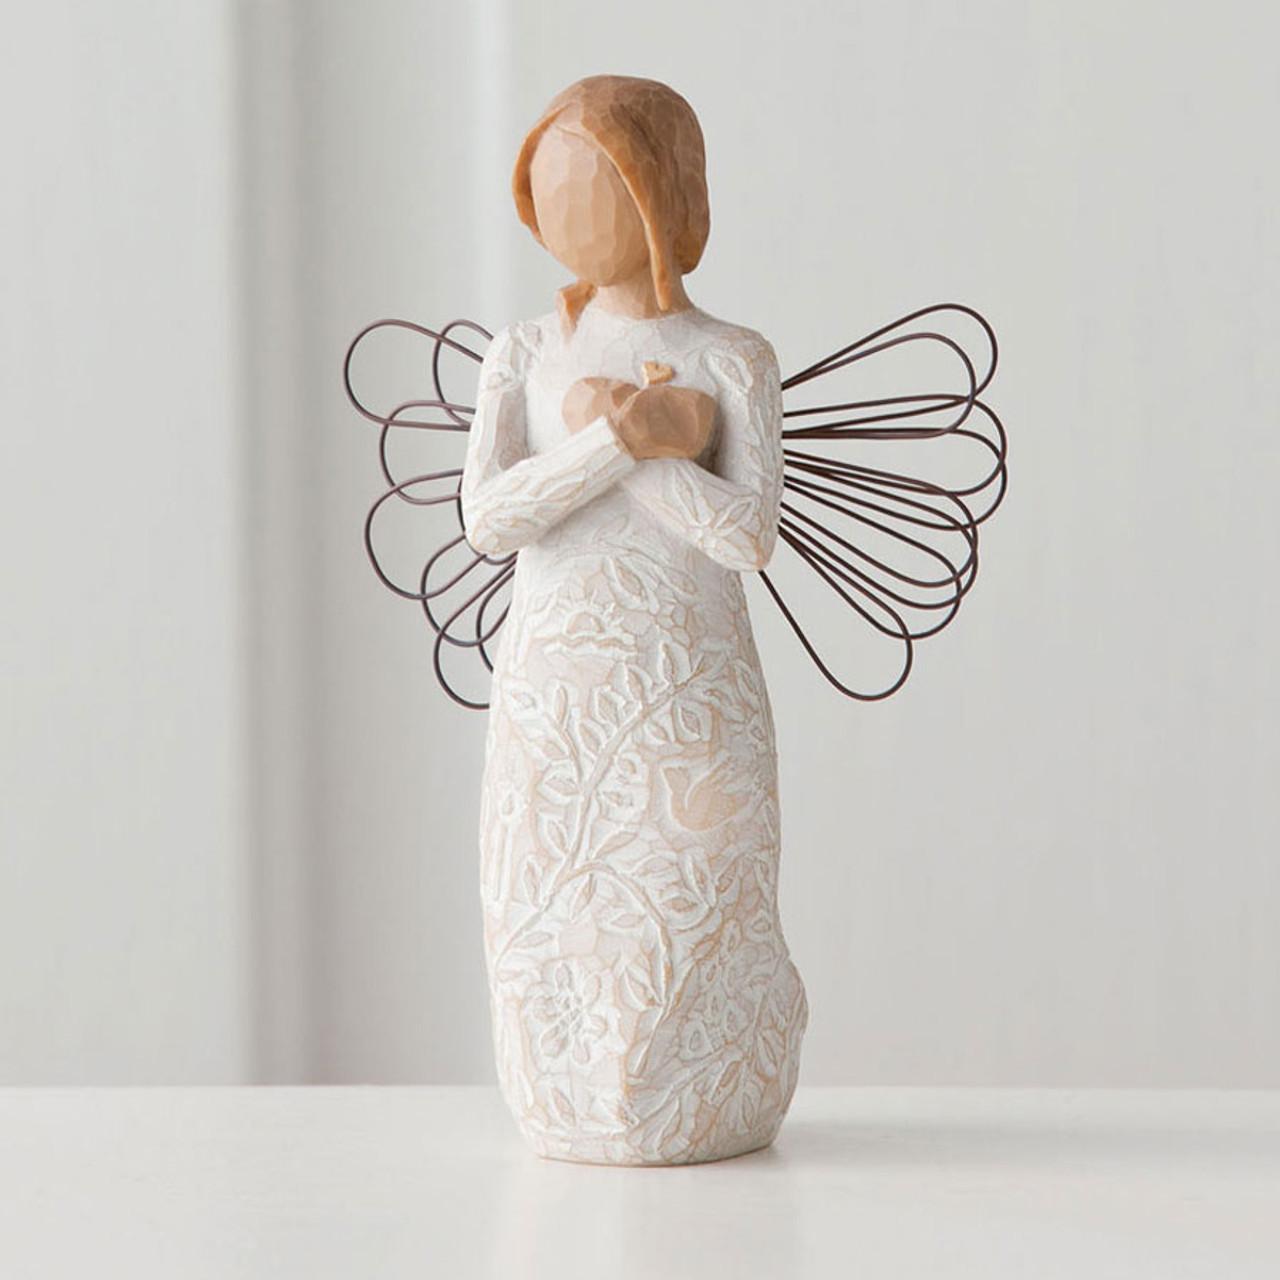 Willow Tree Figurine Angel of Comfort Figurine